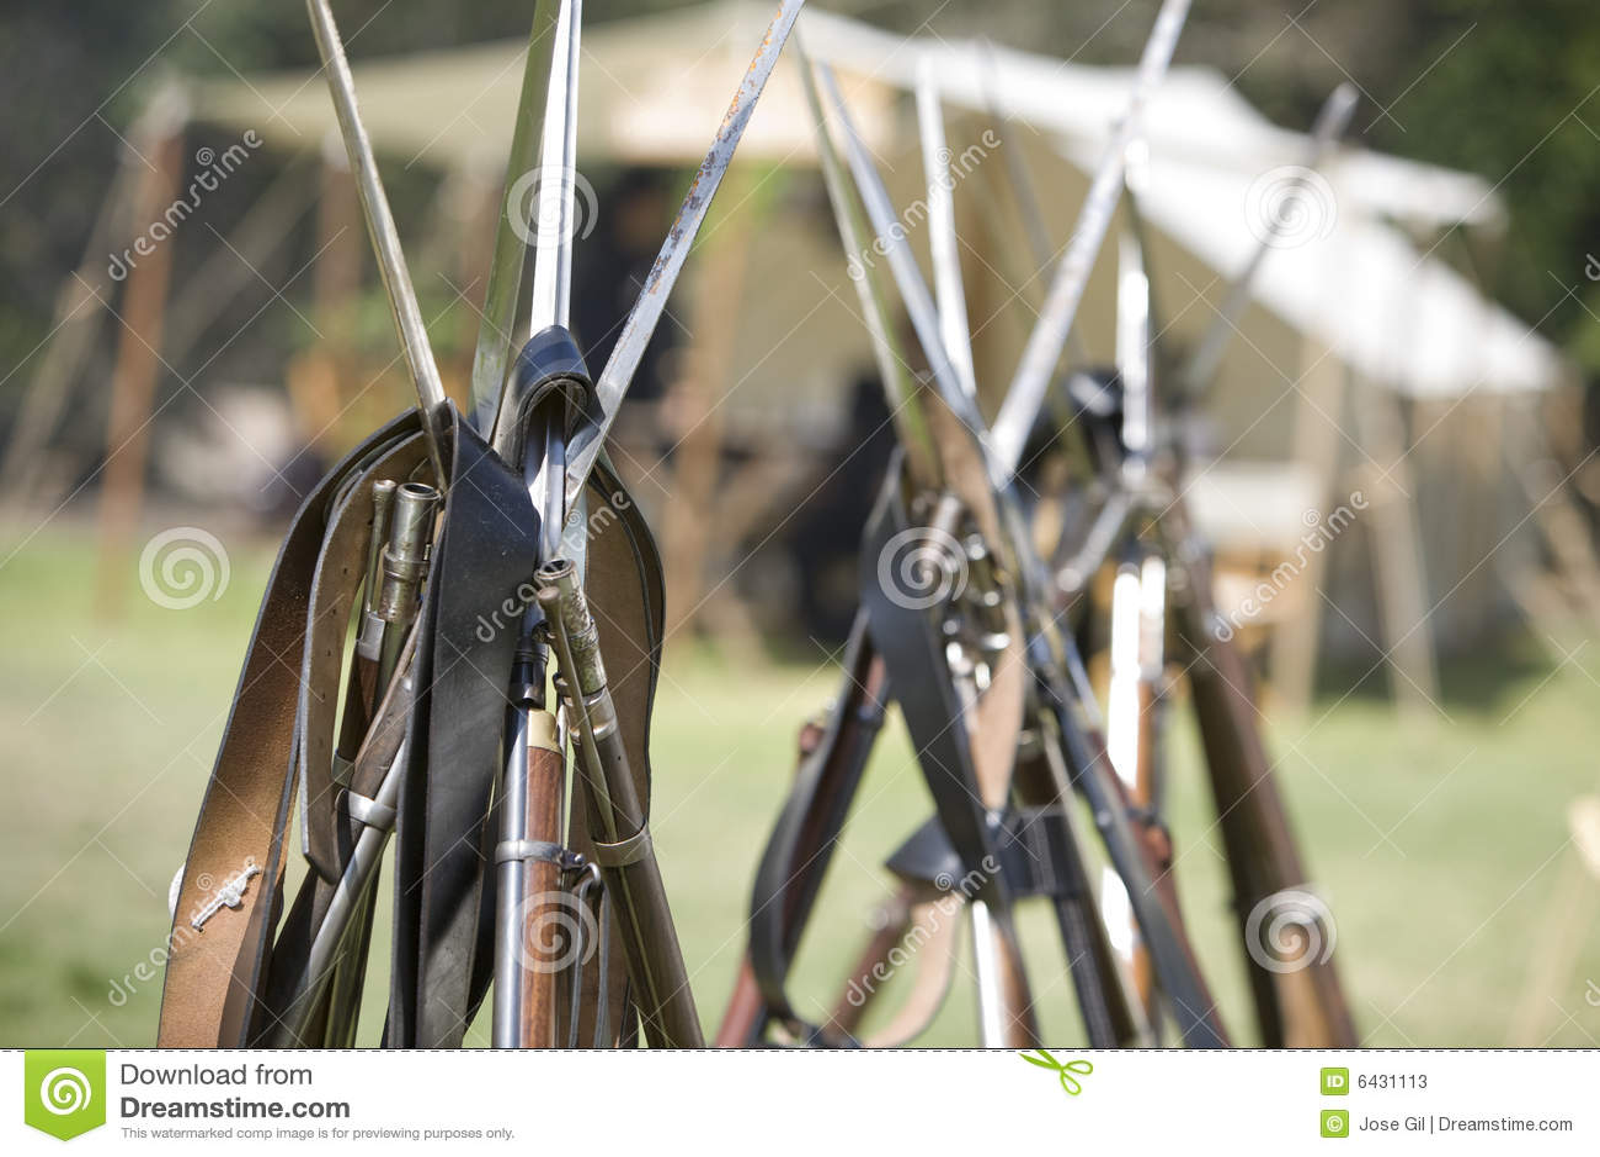 HB Civil War Re-Enactment 32 - Guns Stacked